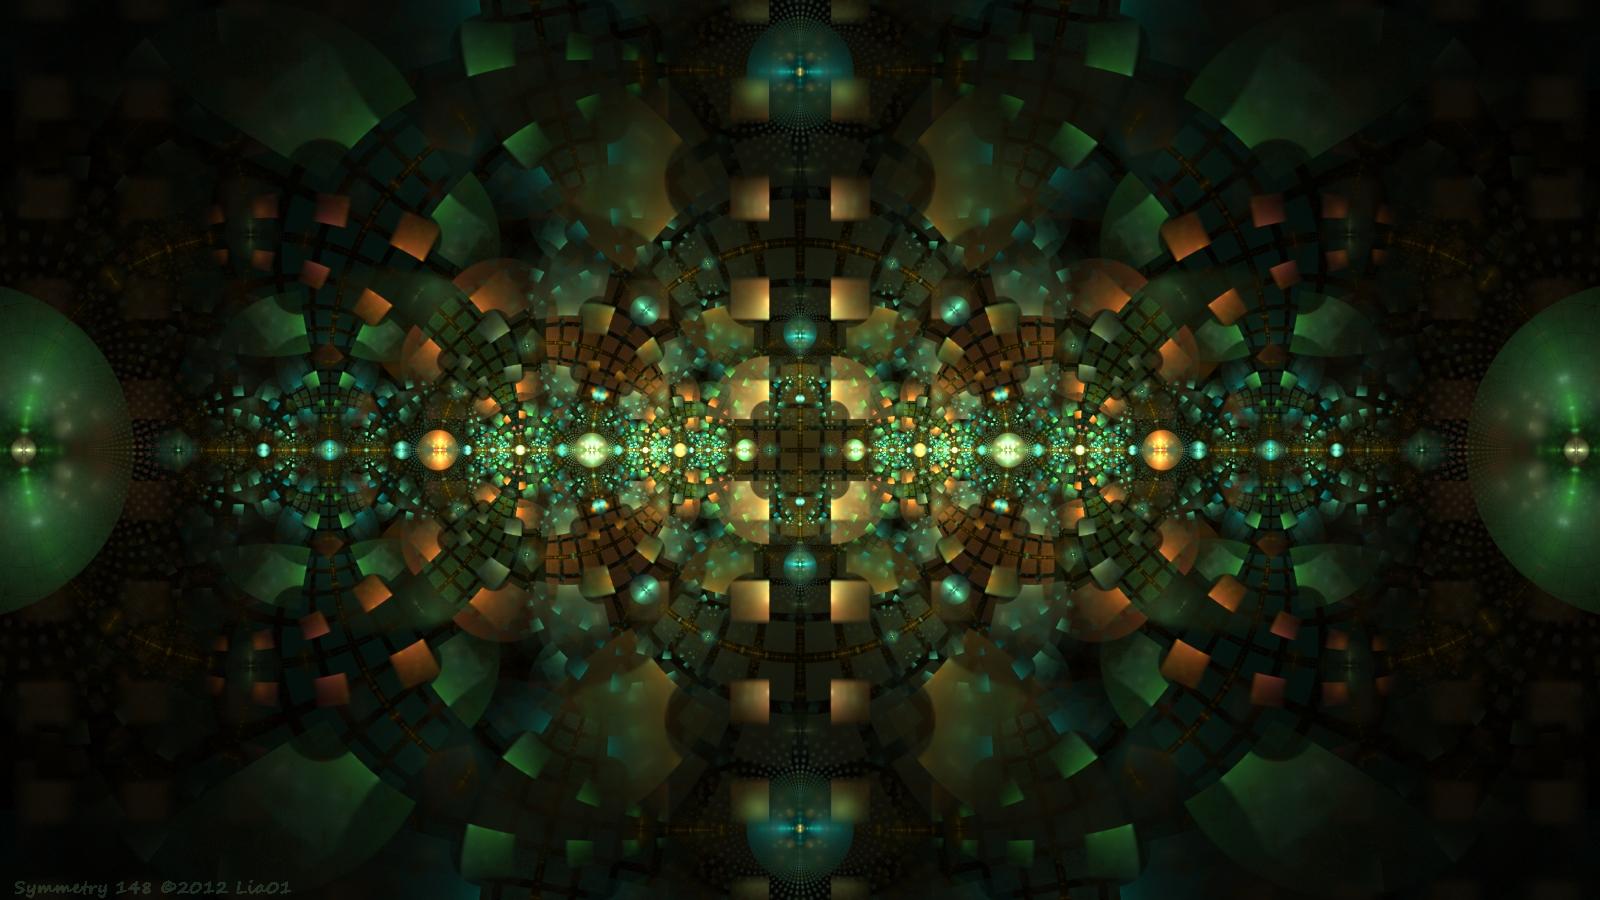 Symmetry 148 by GraphicLia